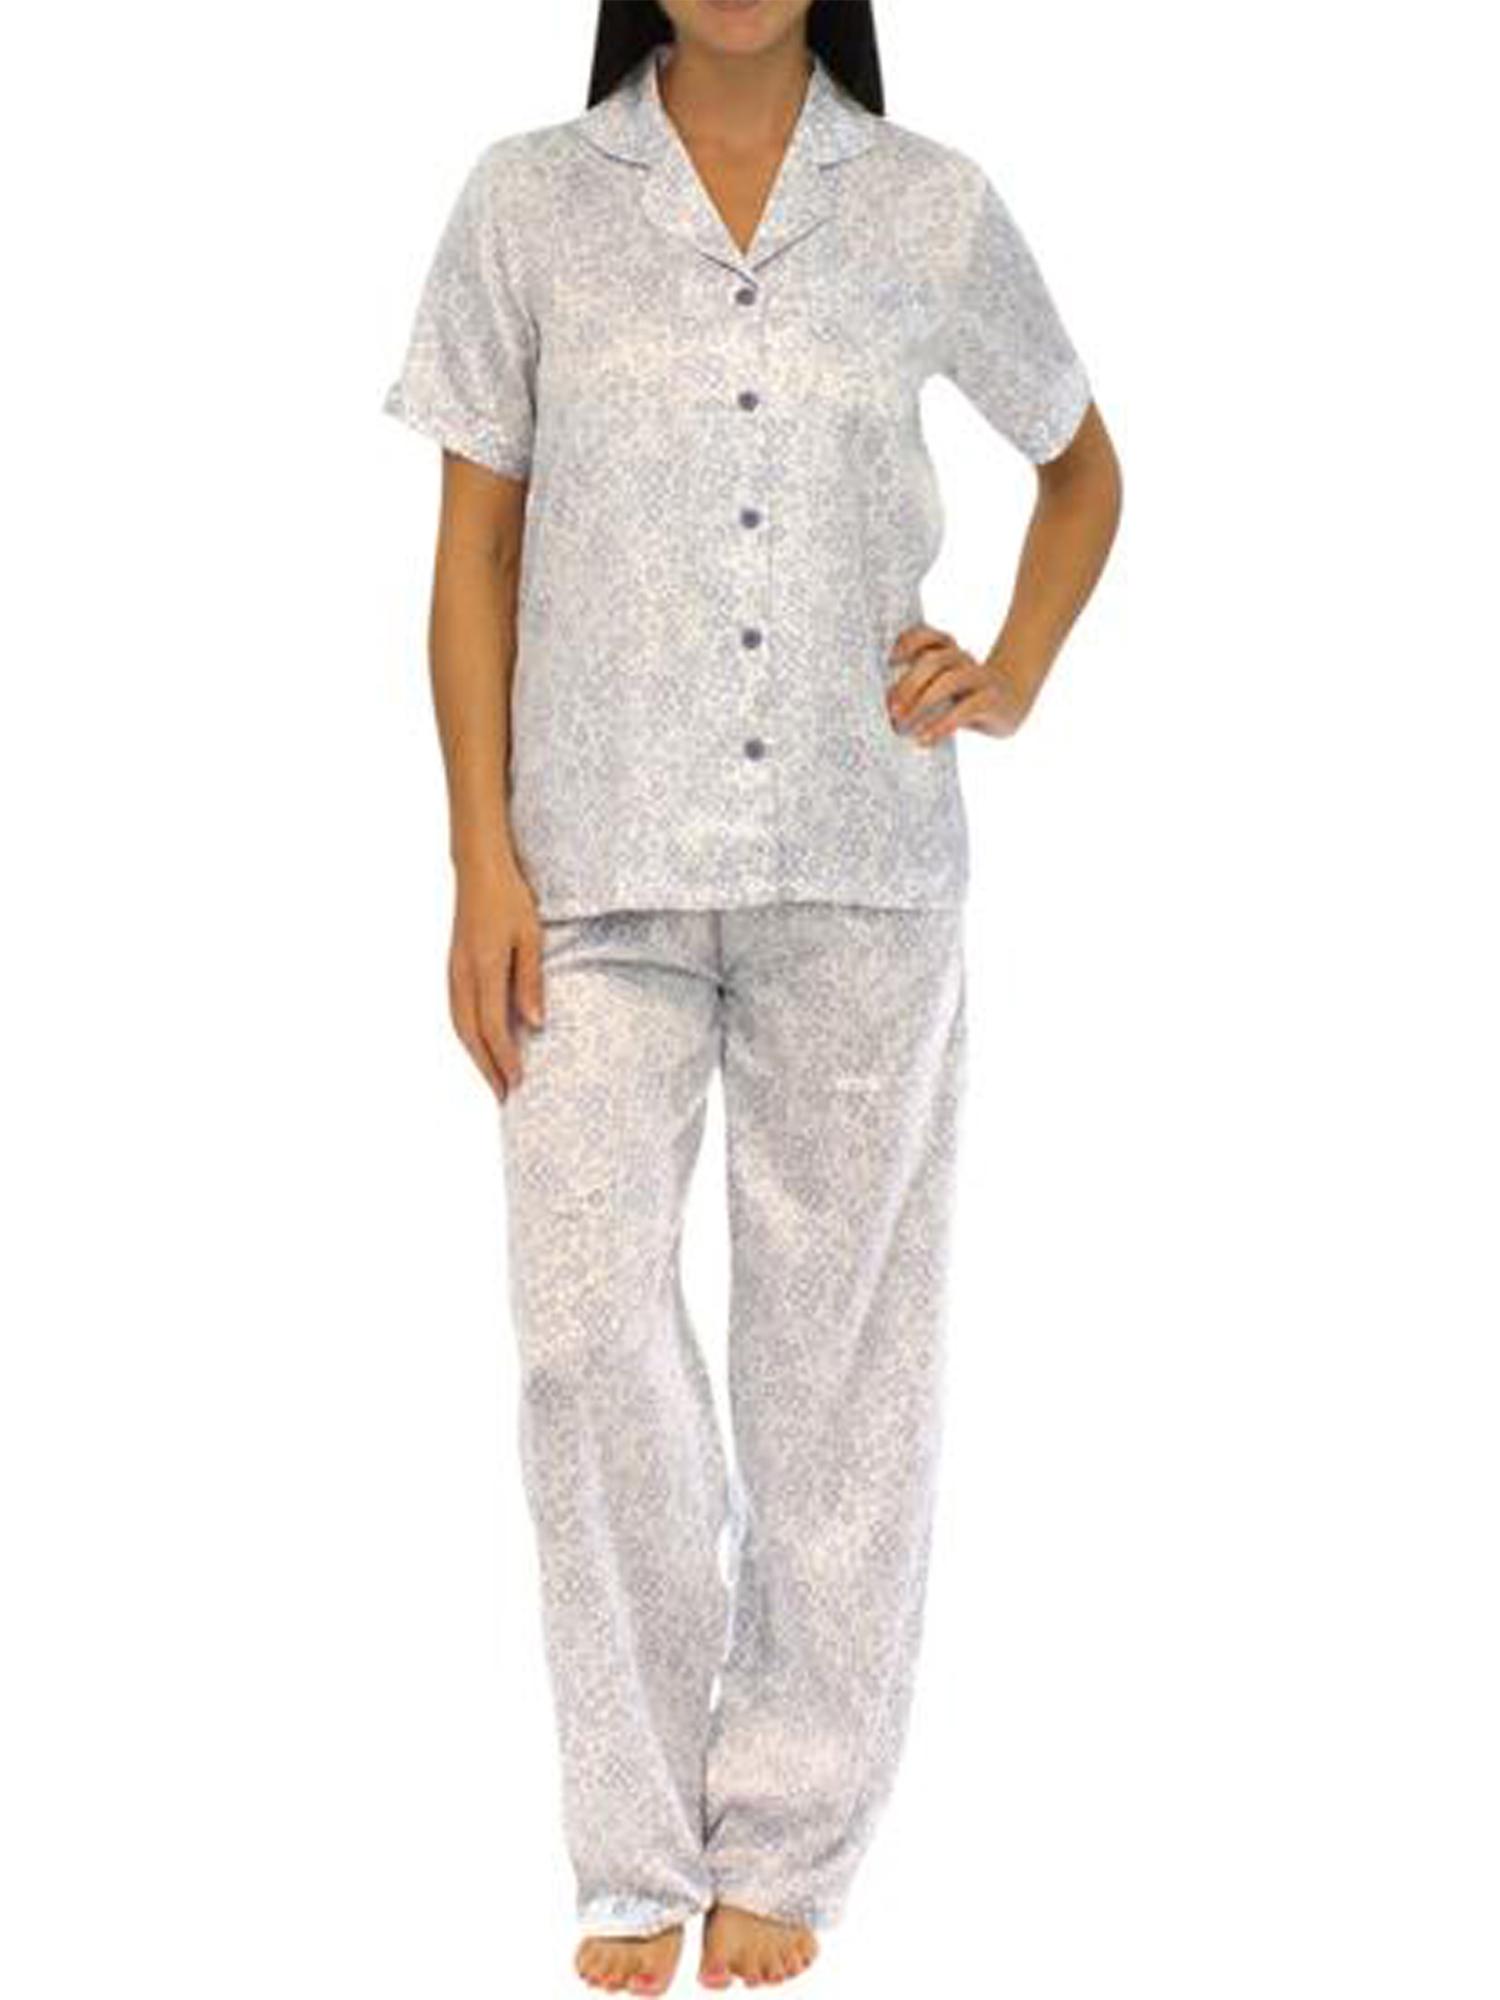 Pajama Heaven Satin Shortsleeve Lounger Pajama